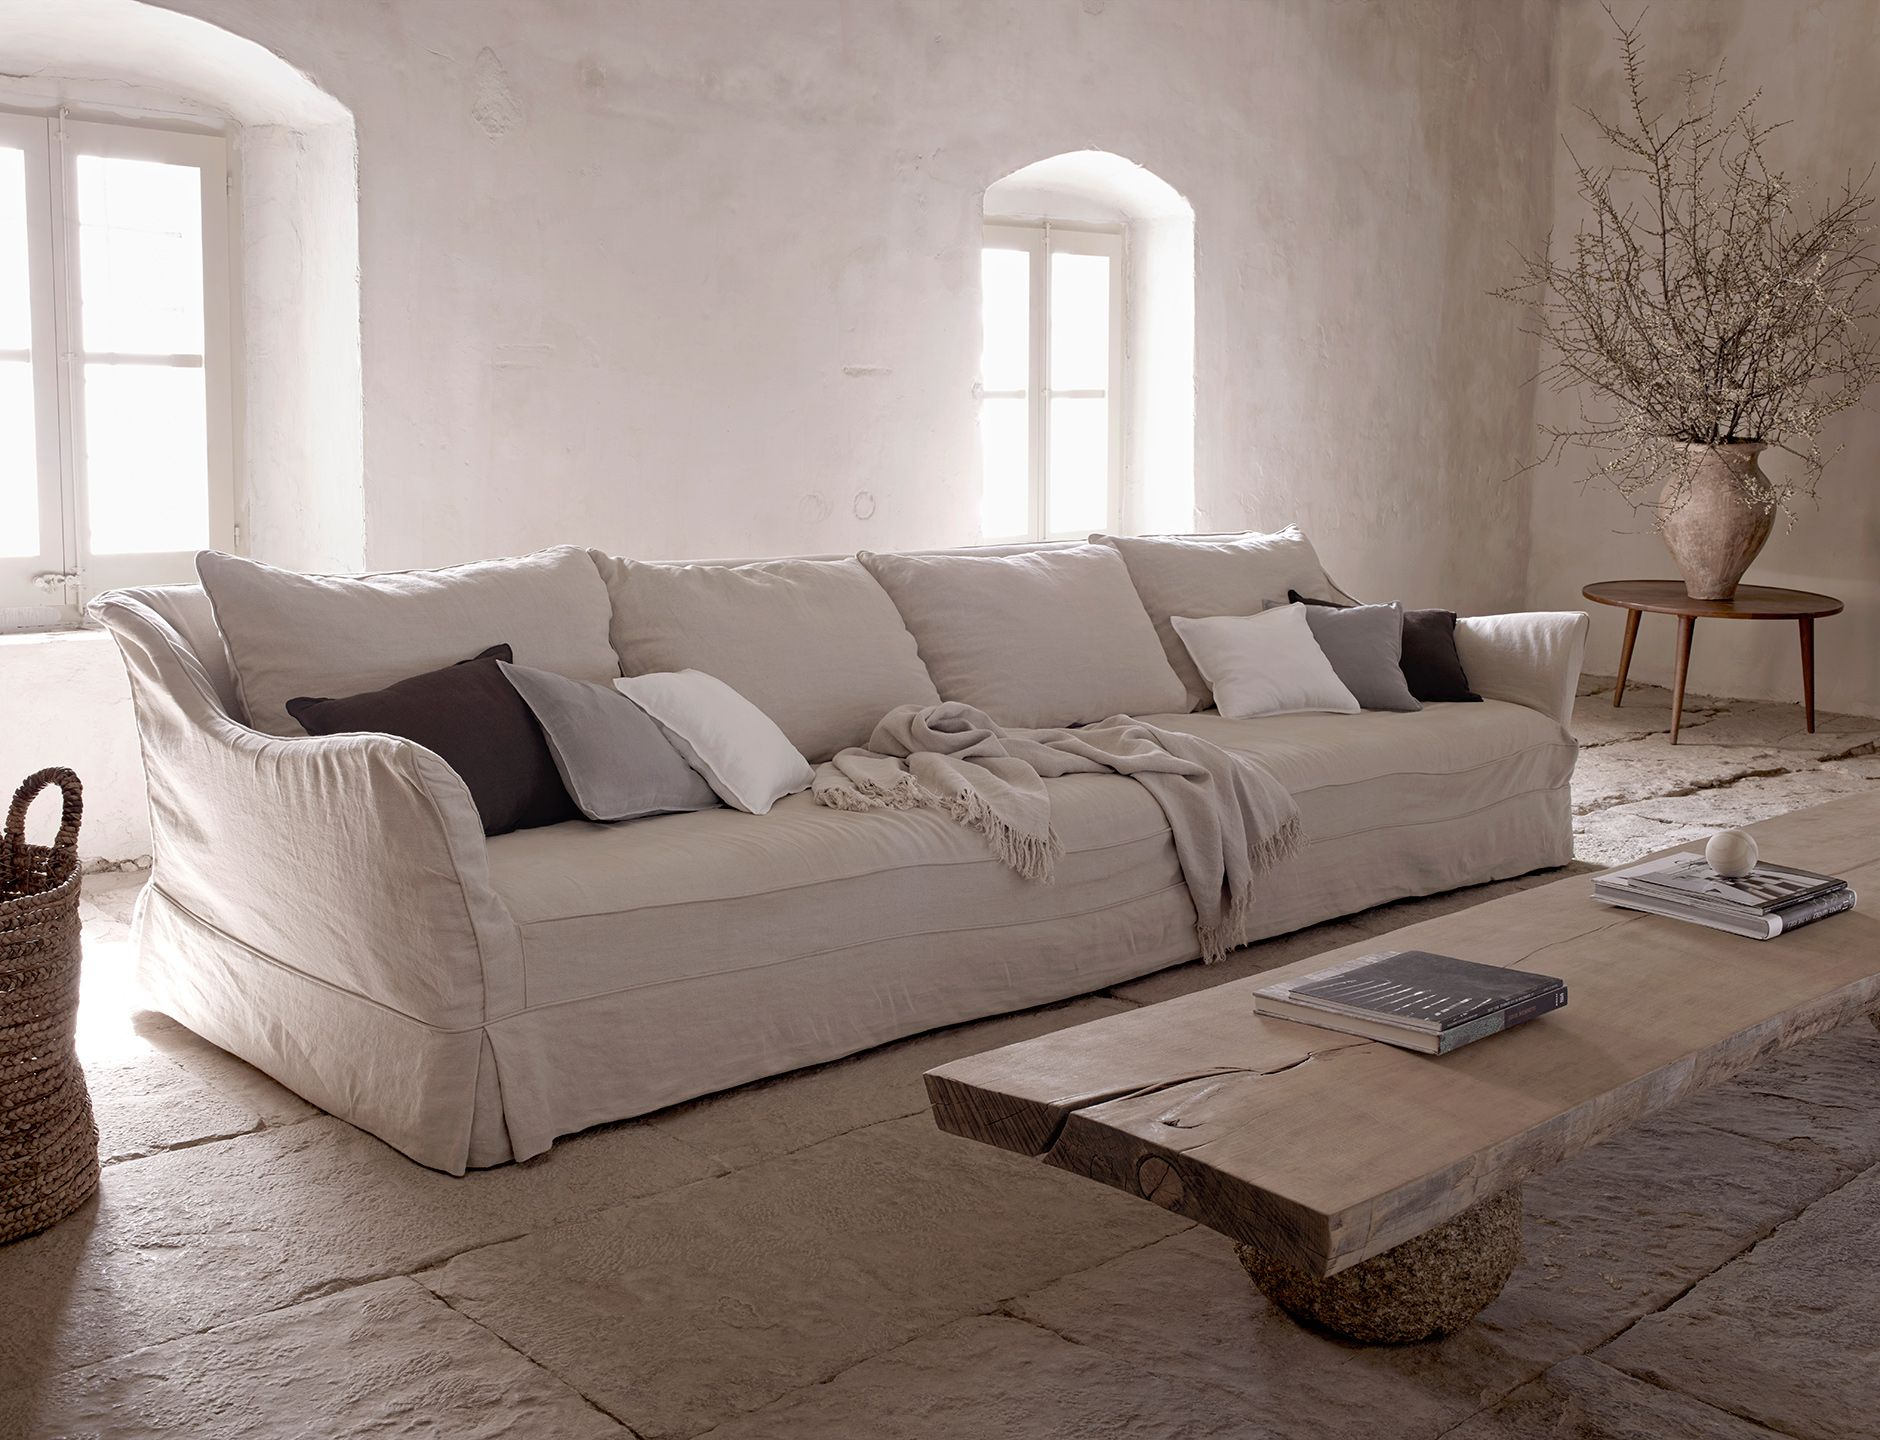 Zara home interior design - Room Interiores De Casas Rusticas Salon Campero Zara Home